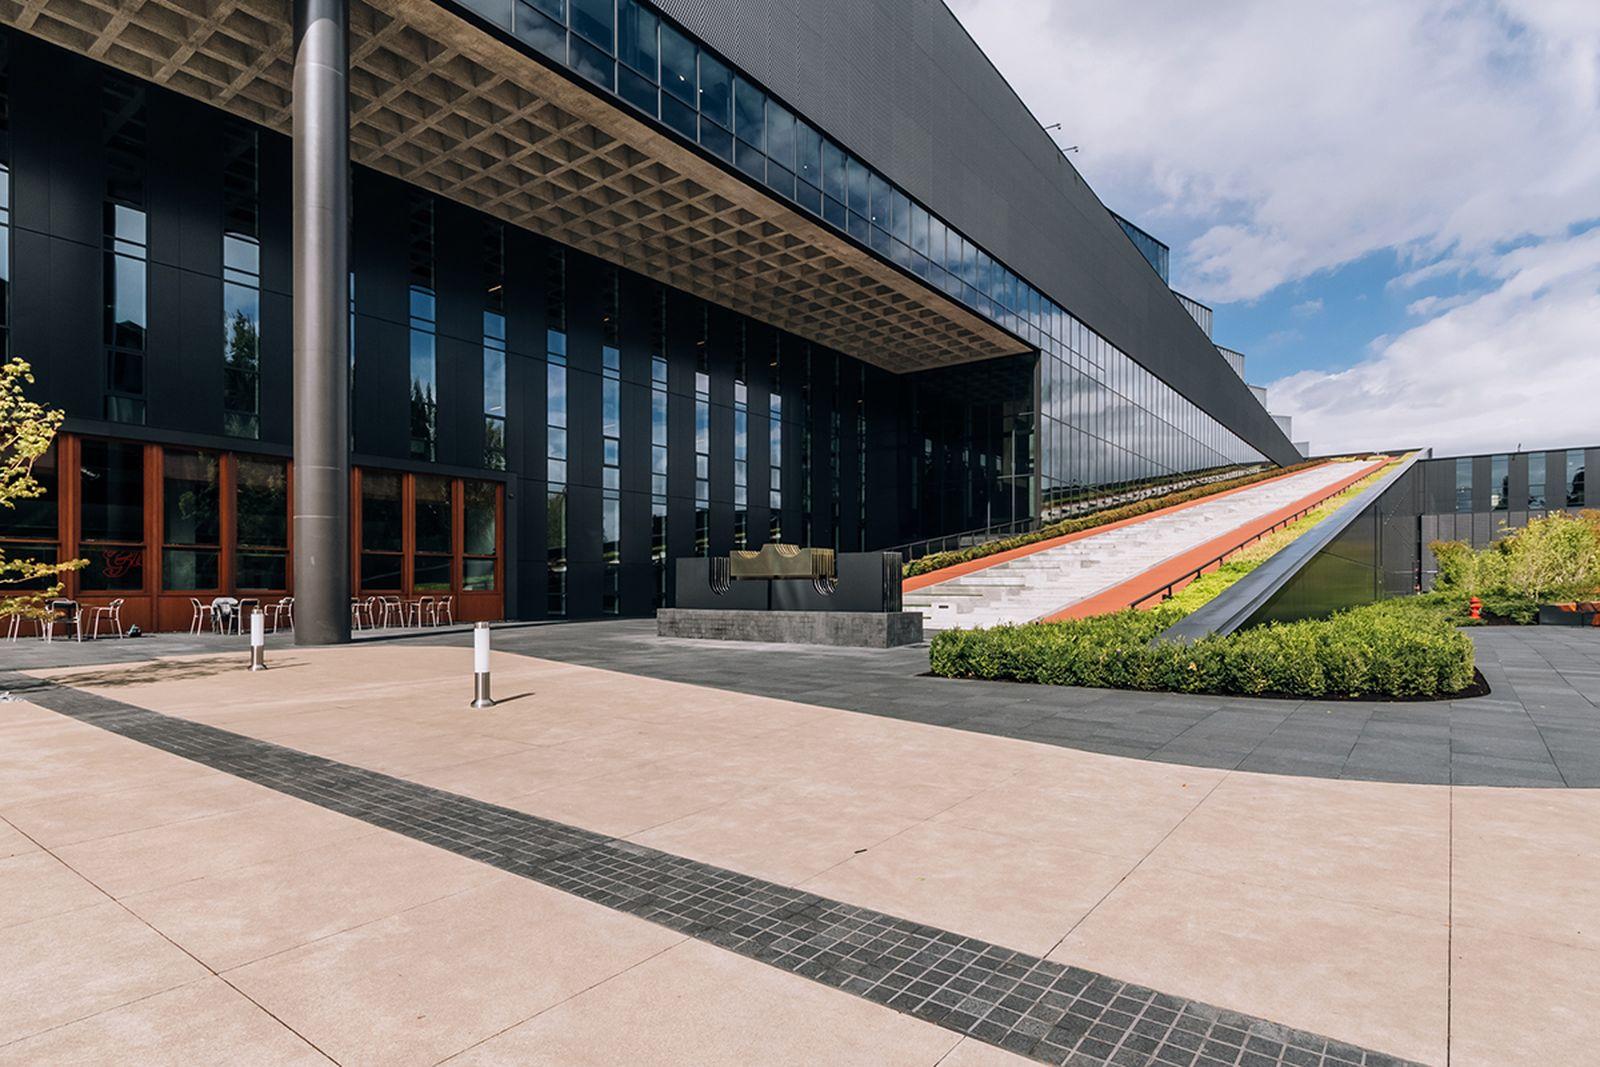 nike-lebron-james-innovation-center- (5)